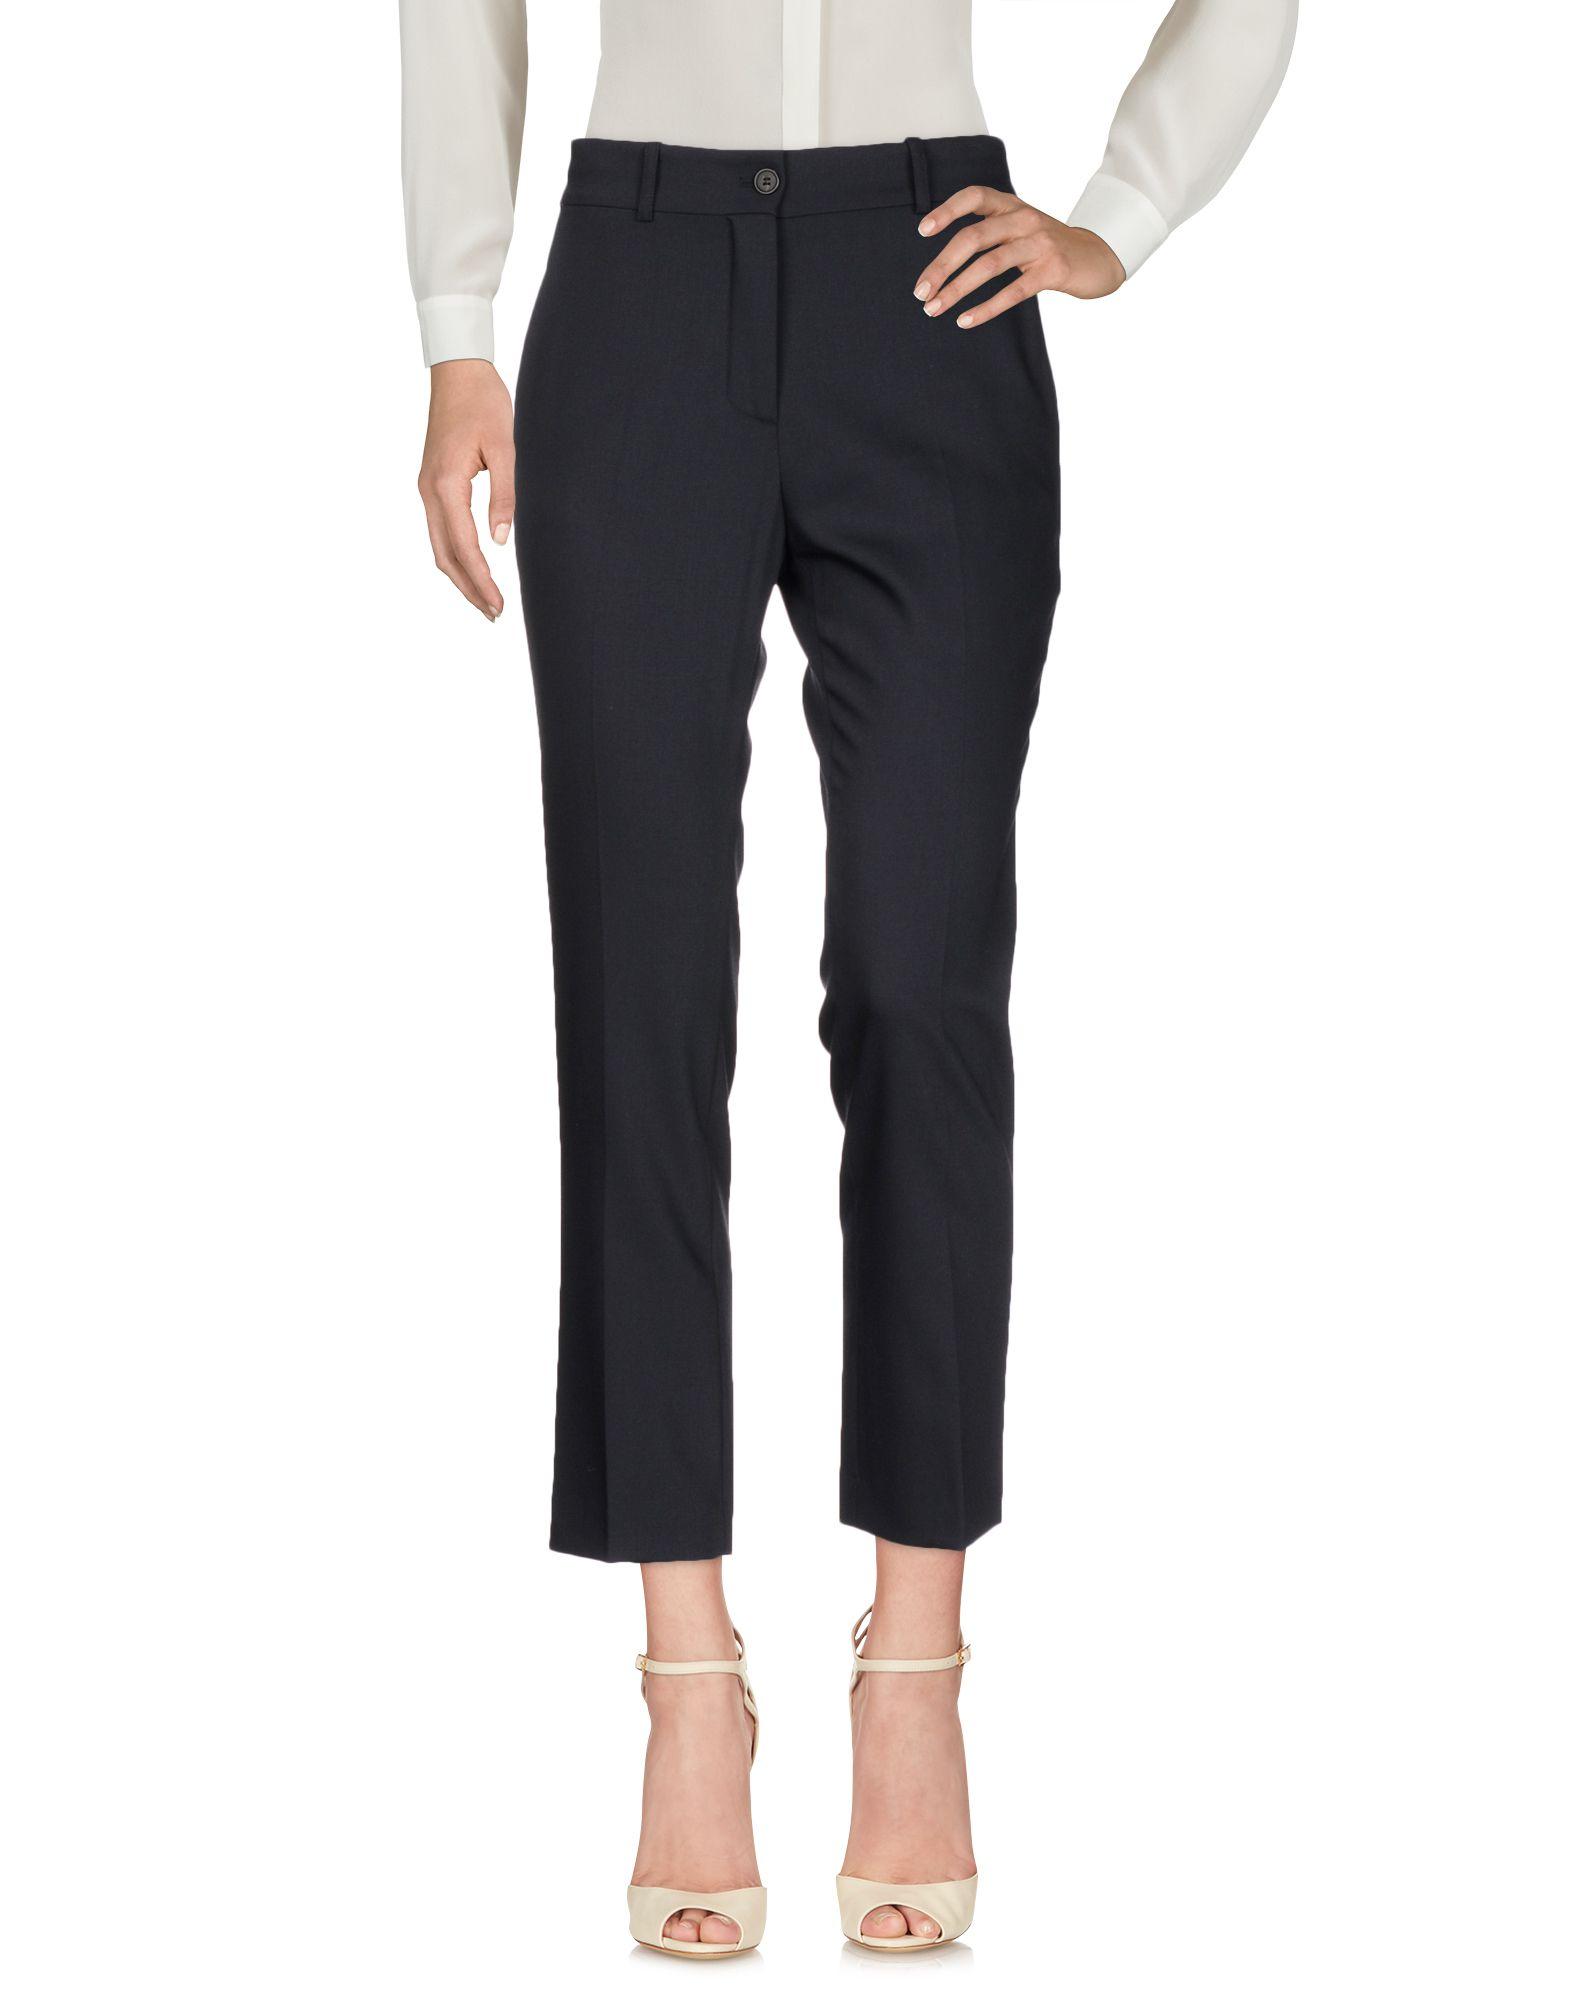 Pantalone Jil Sander Navy Donna - Acquista online su p42pQ